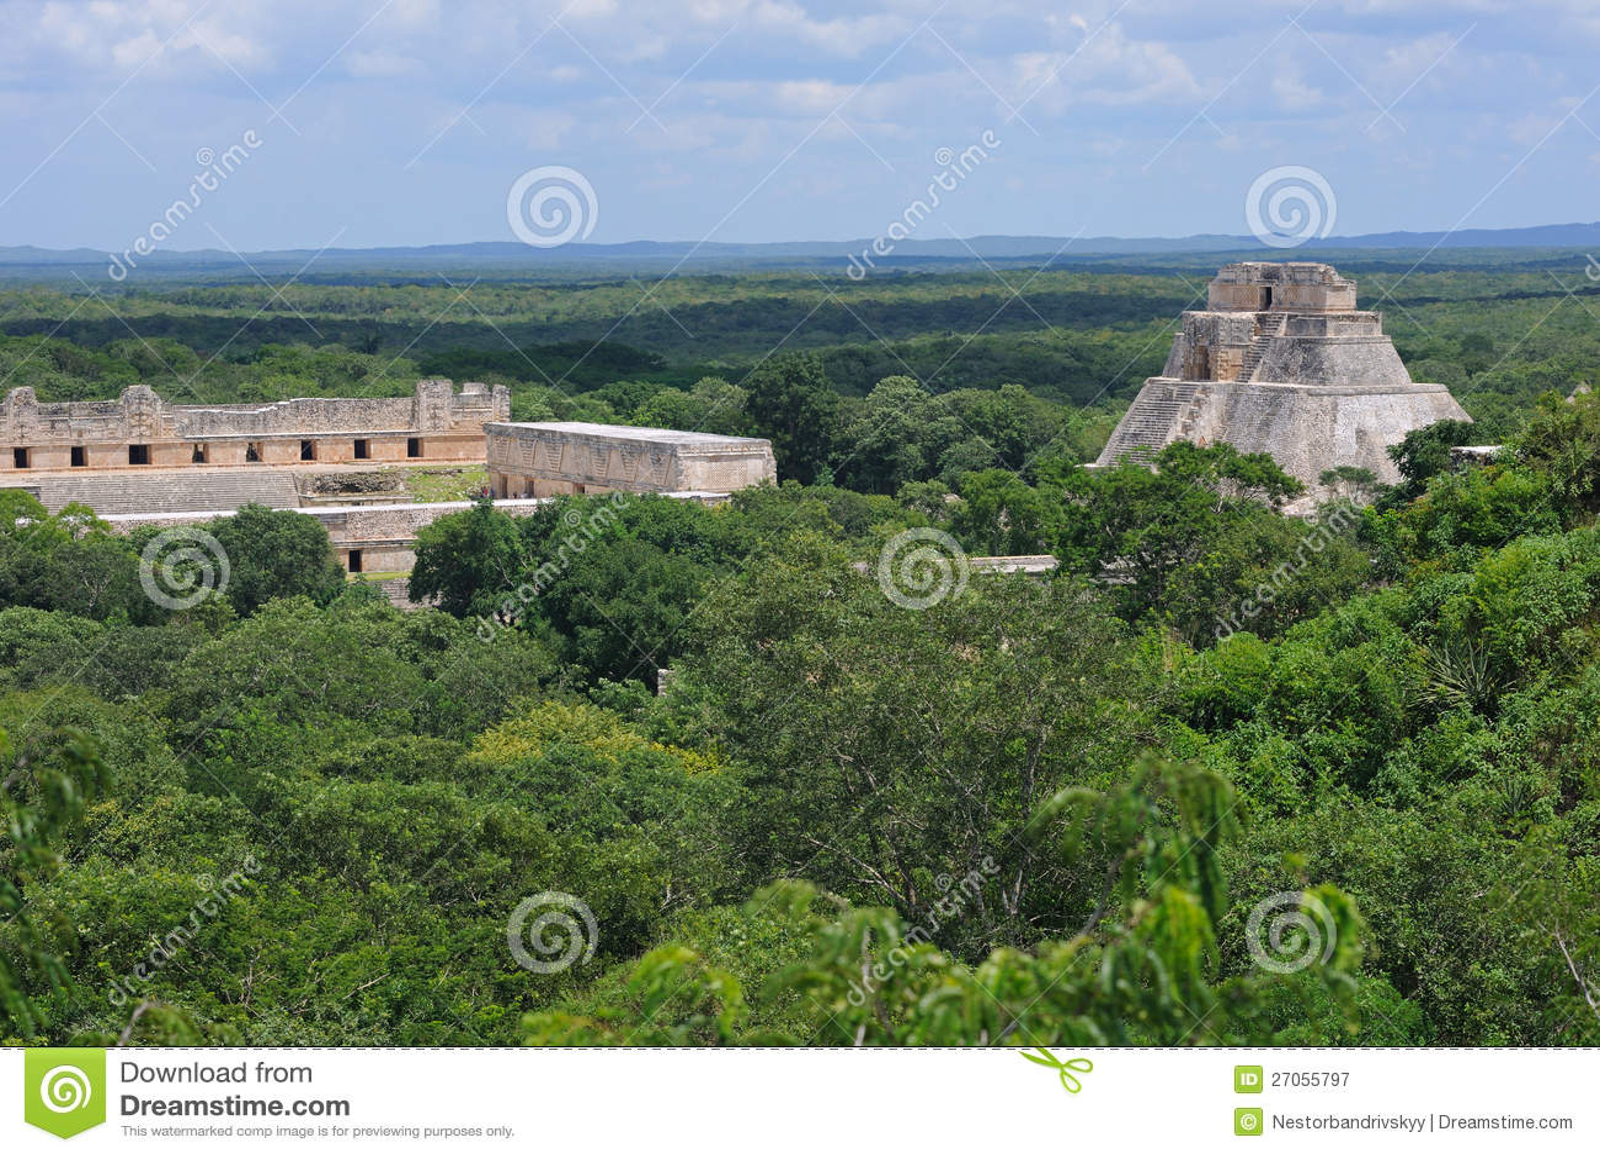 Anicent mayan pyramid